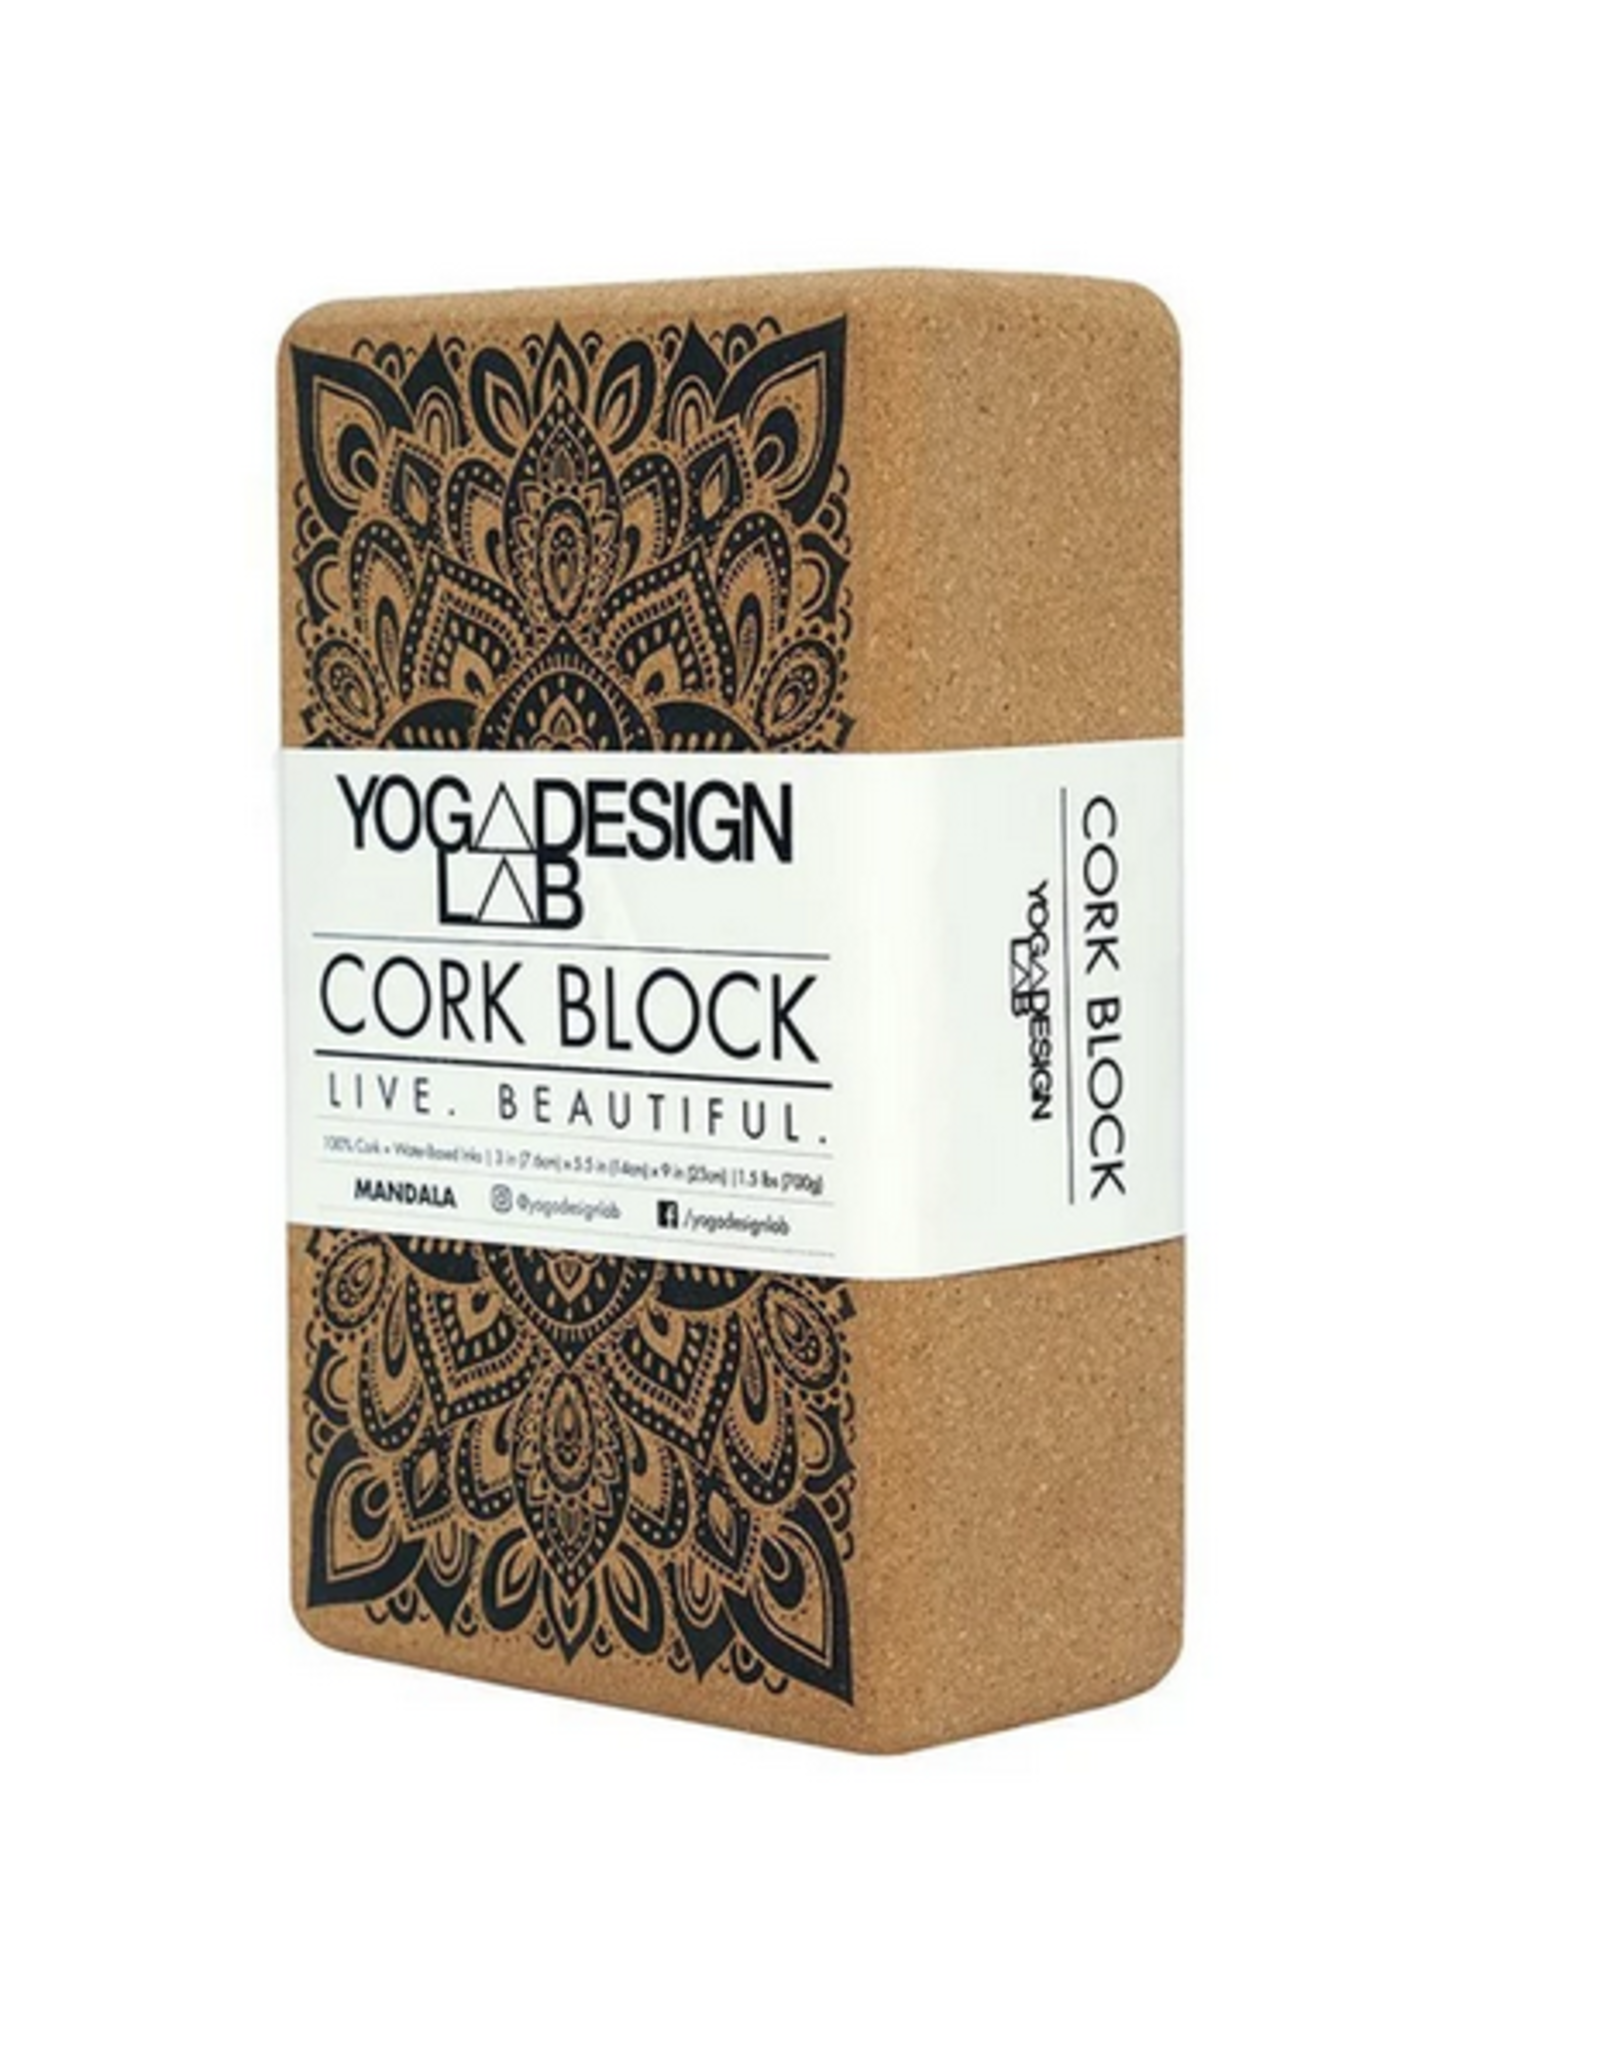 YOGA DESIGN LAB CORK YOGA BLOCK